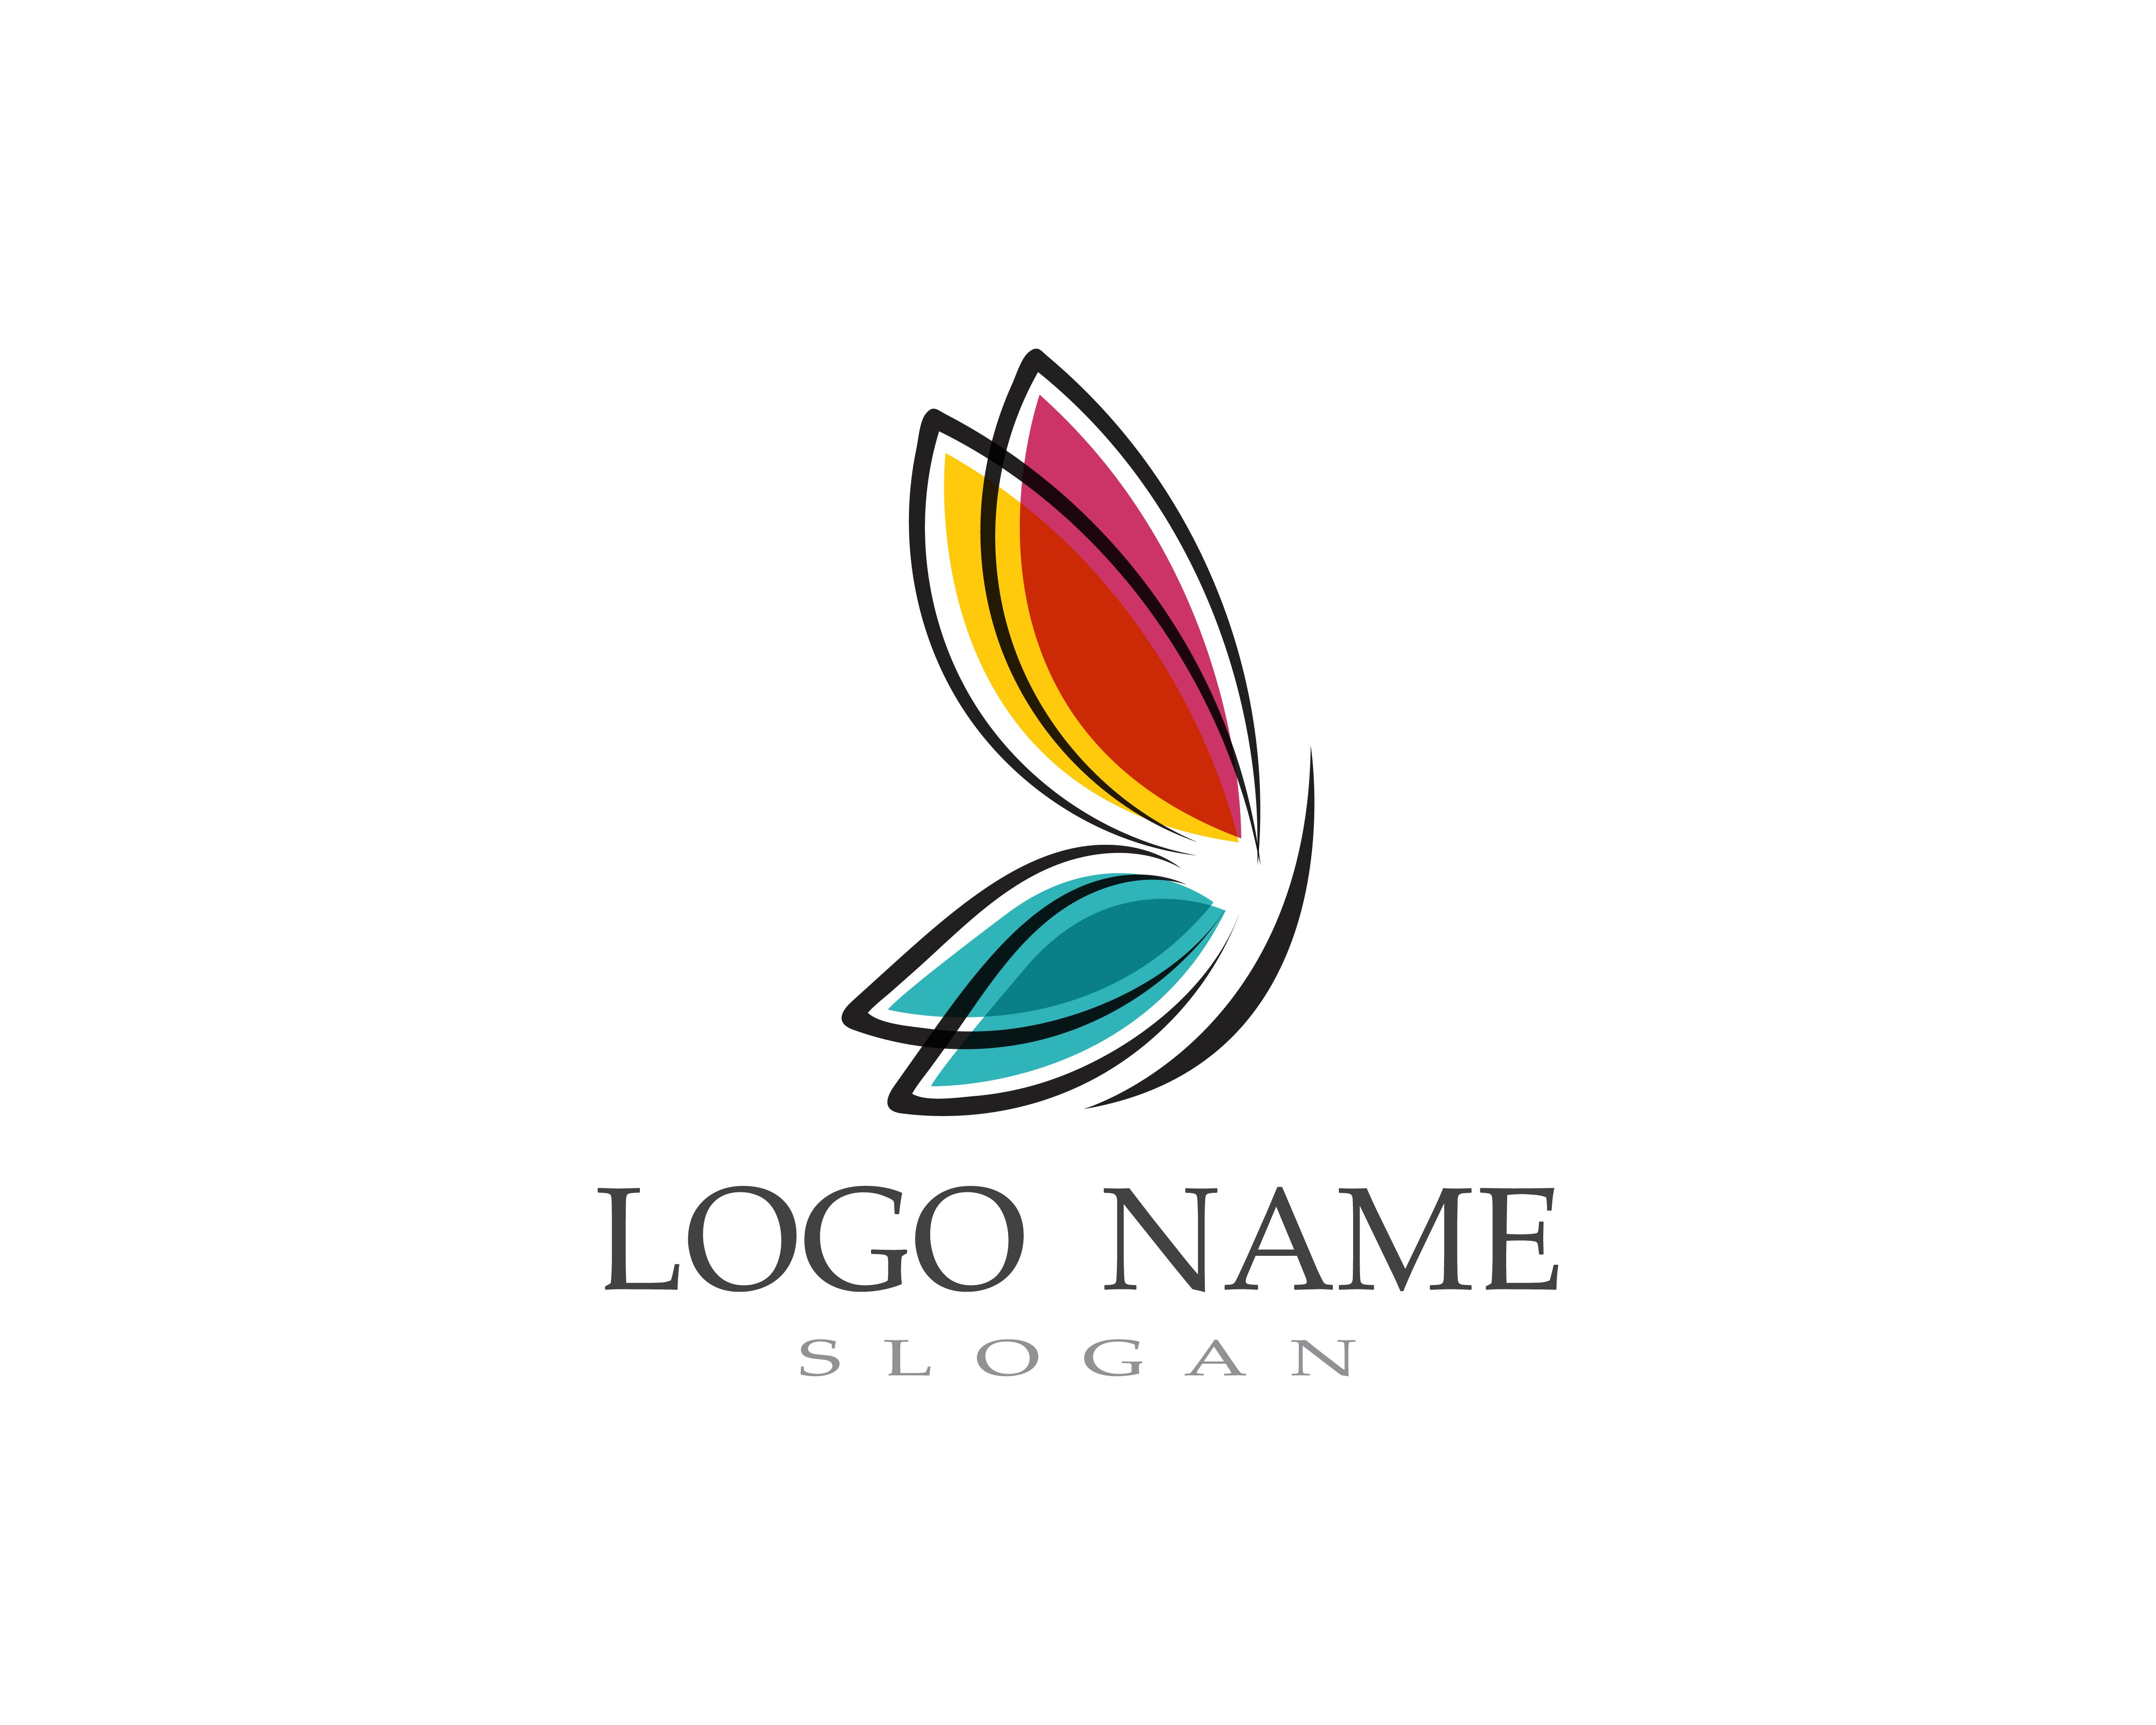 ai logo 免費下載 | 天天瘋後製